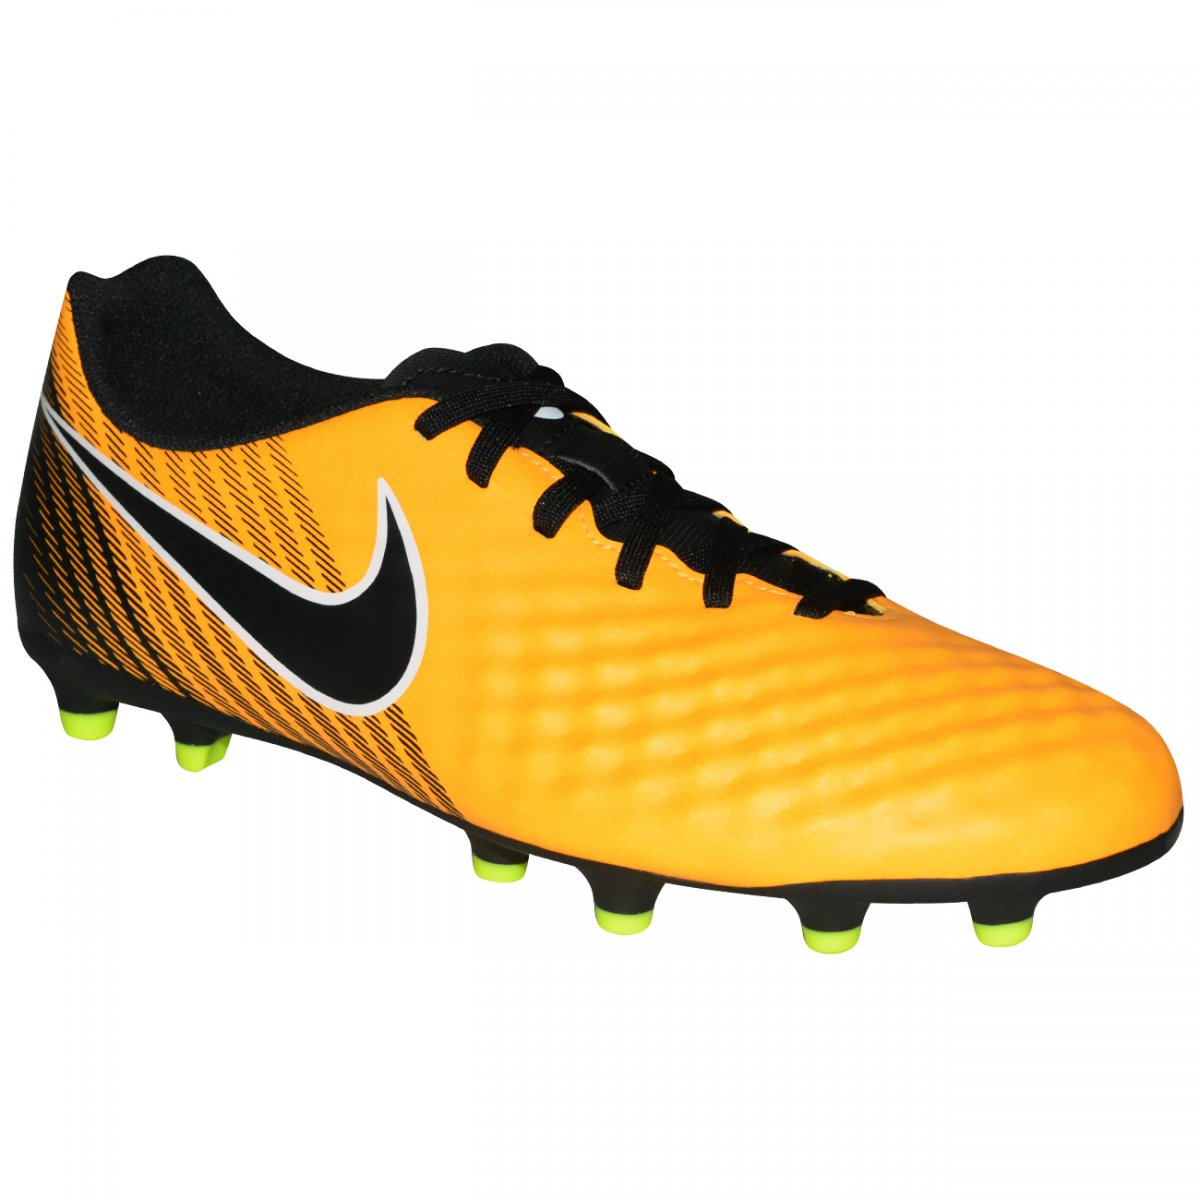 791ef4563b Chuteira Nike Magista Ola II 844420 801 - Amarelo preto - Chuteira Nike